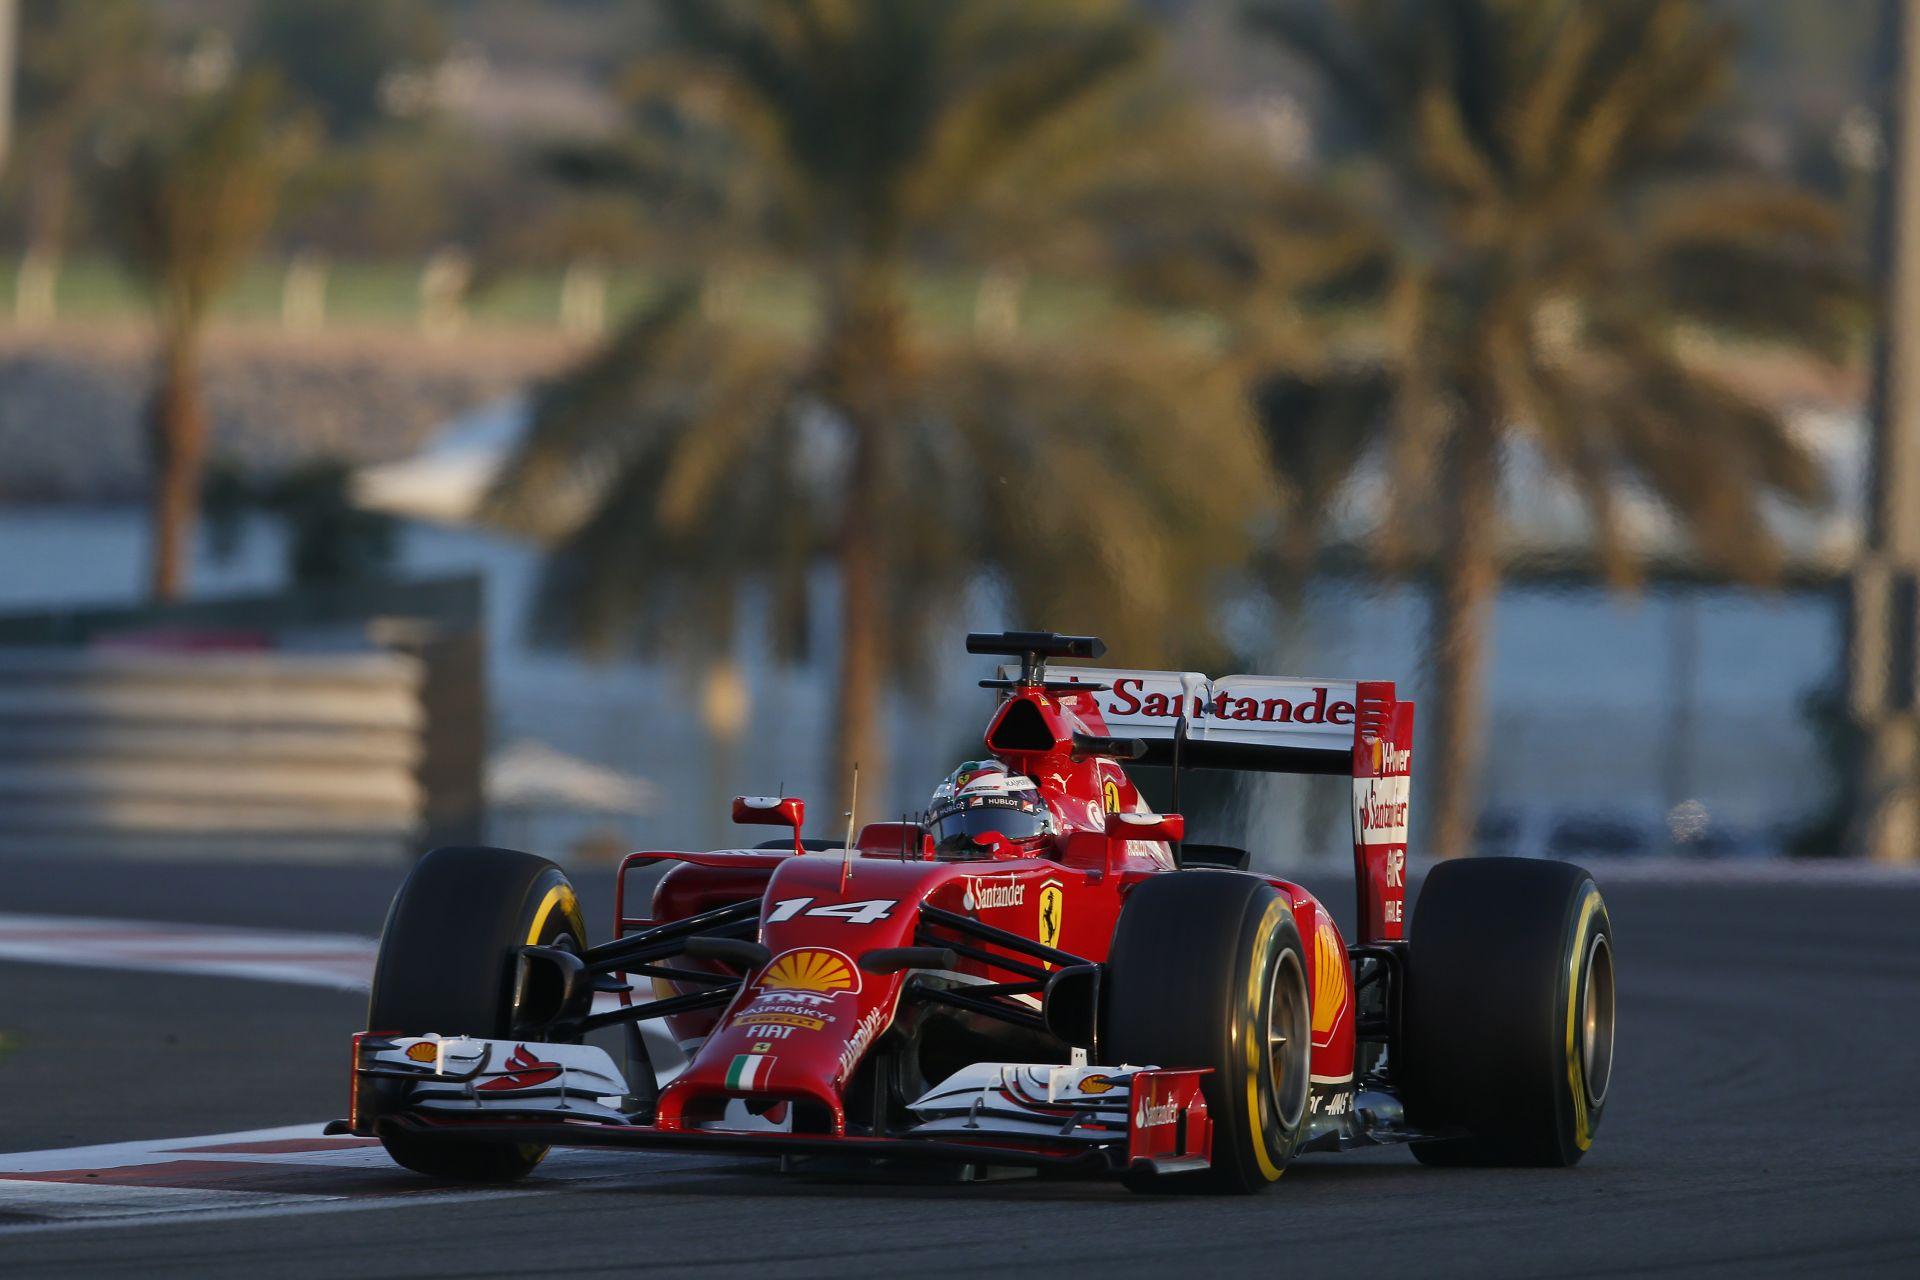 Alonso már nem is követi a Scuderia Ferrarit a Twitteren: Irány a McLaren-Honda!